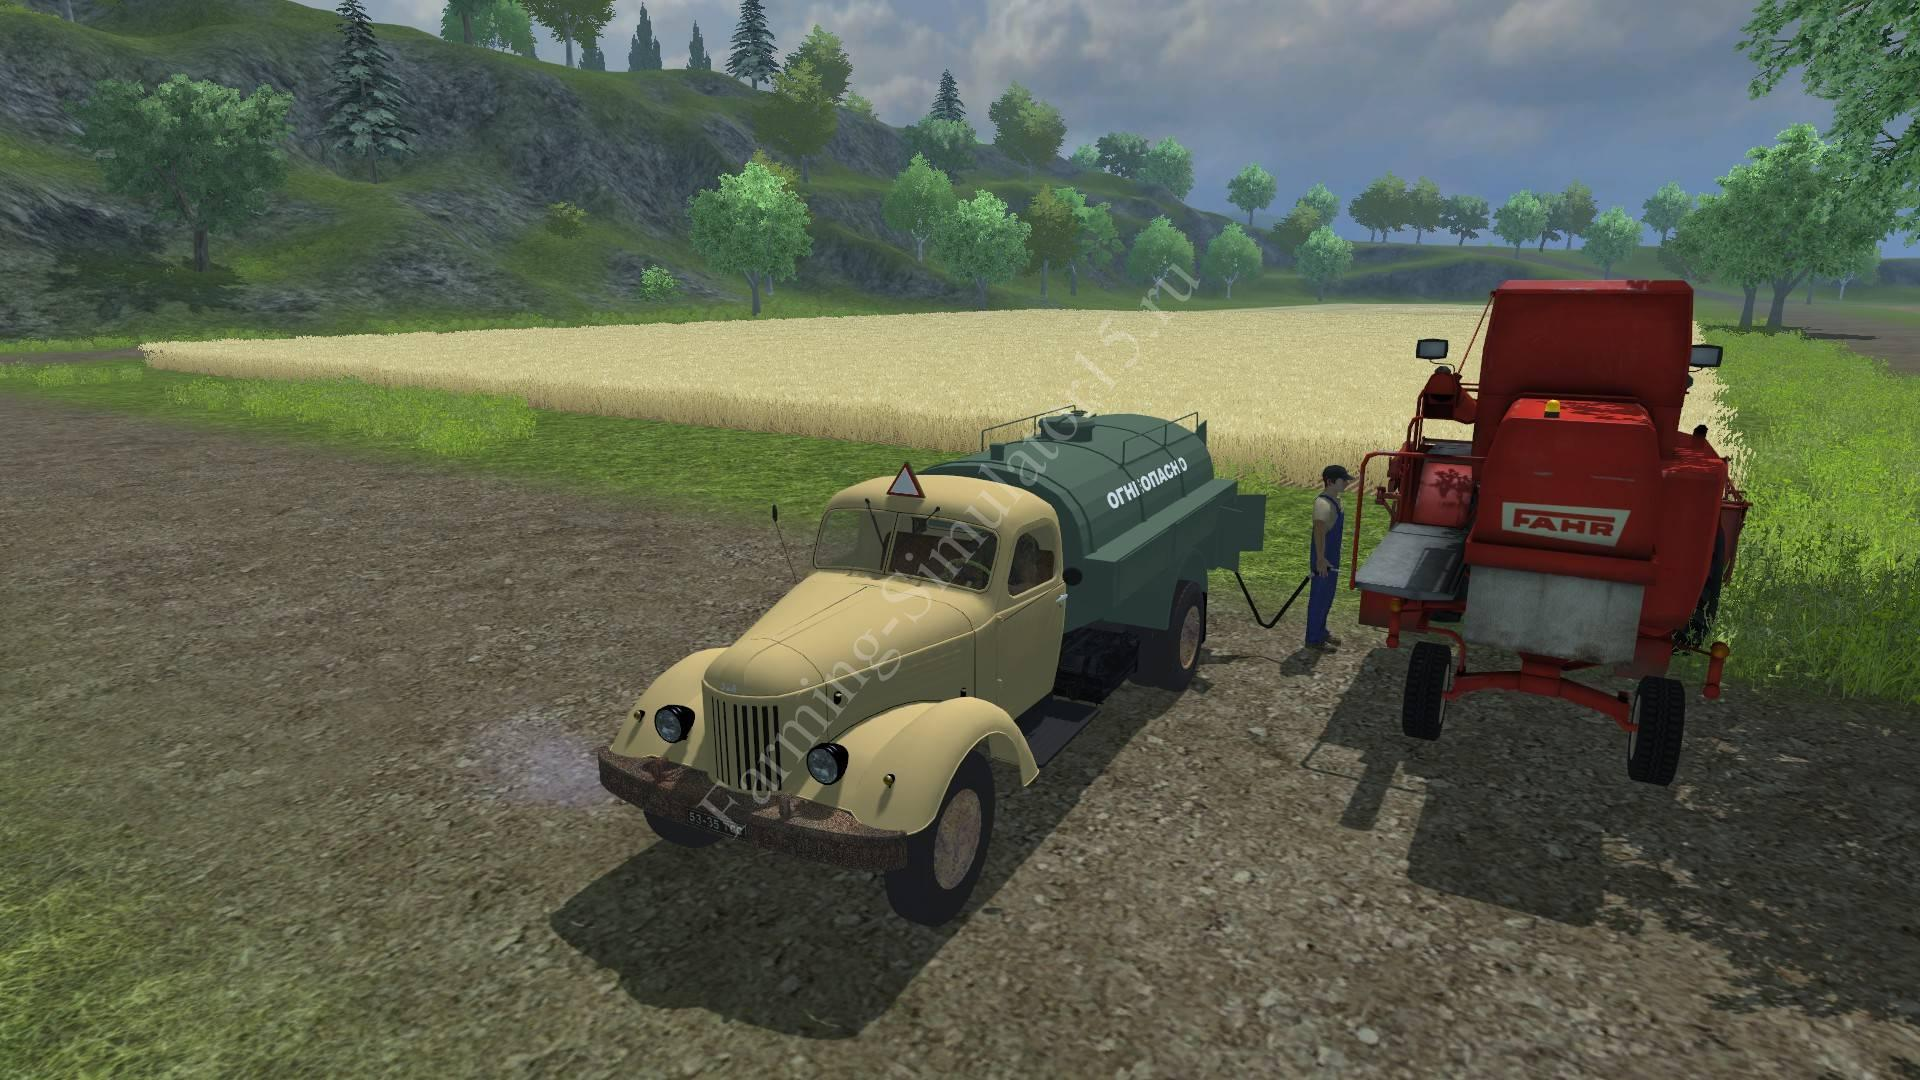 Мод грузовика ZiL TZ 150 v 1.2 Farming Simulator 2013, Farming Simulator 13